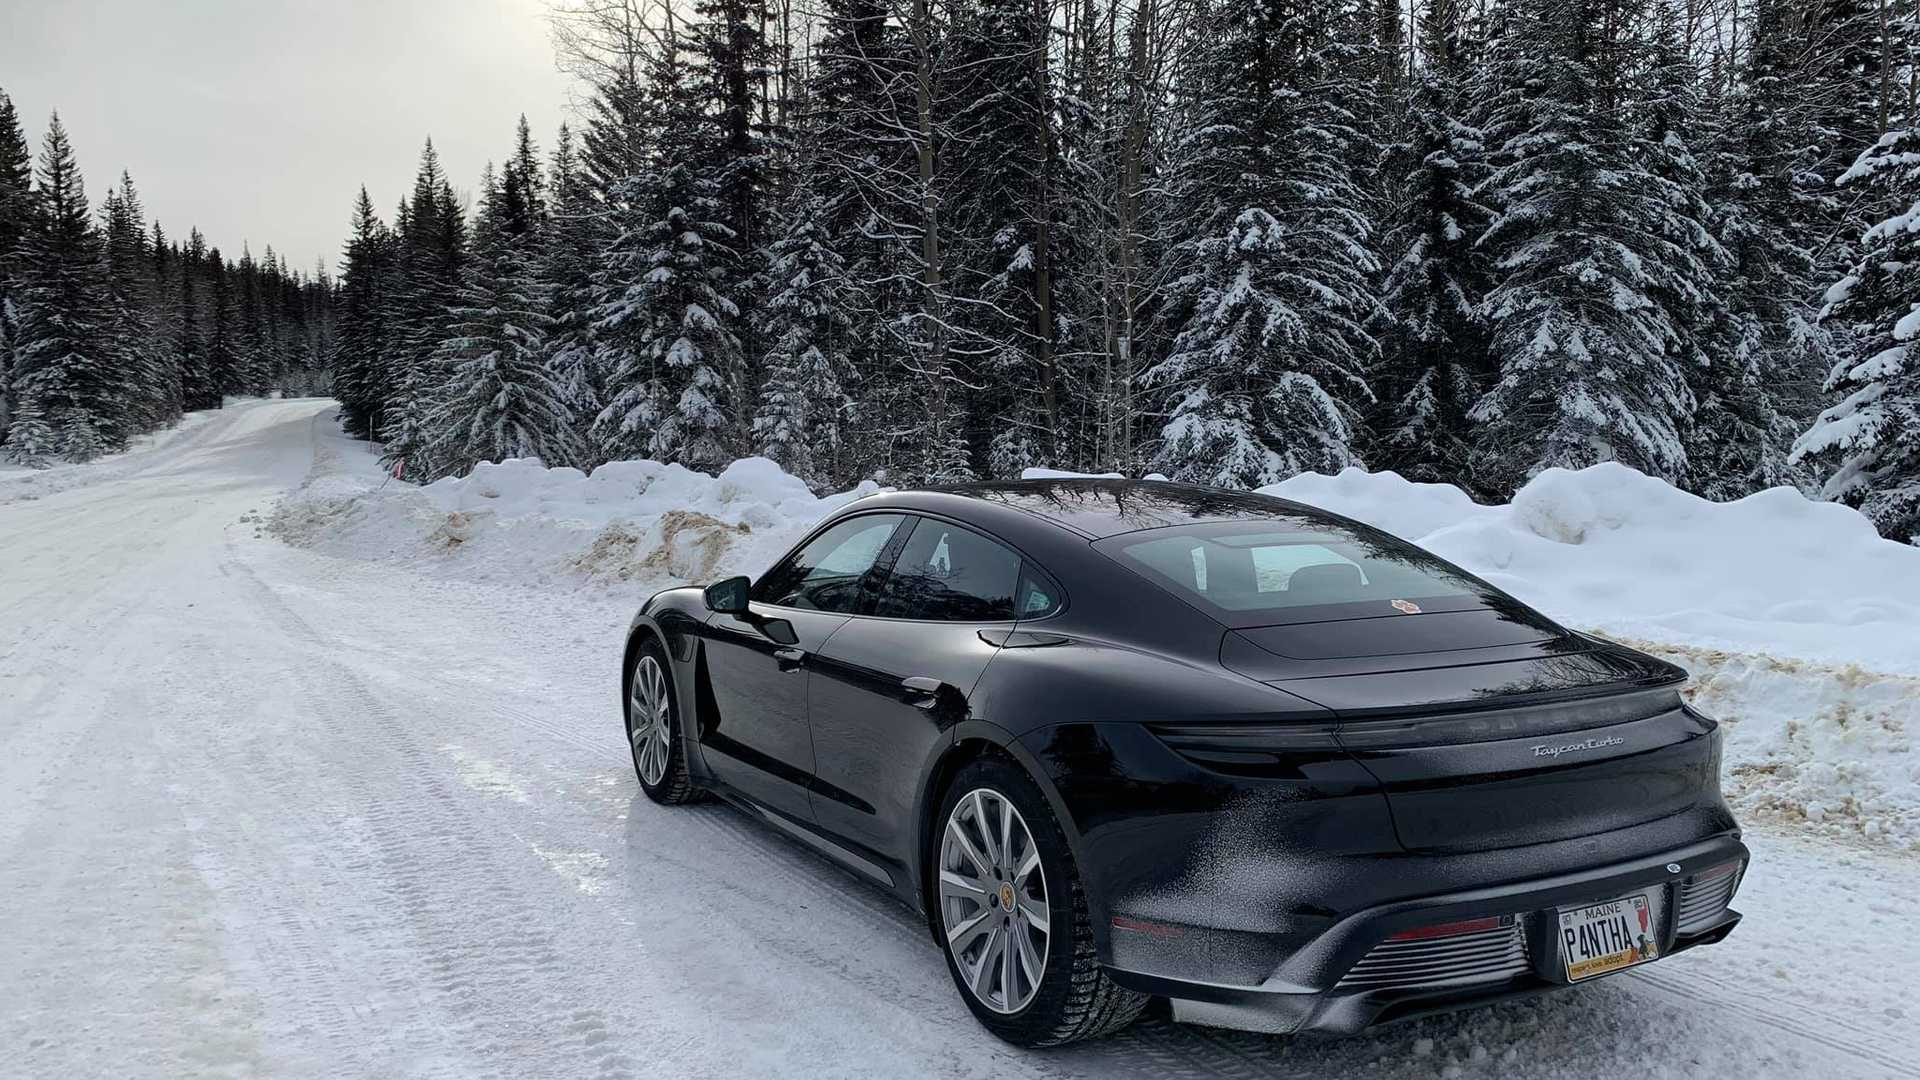 Road_trip_Porsche_Taycan_Turbo_0011